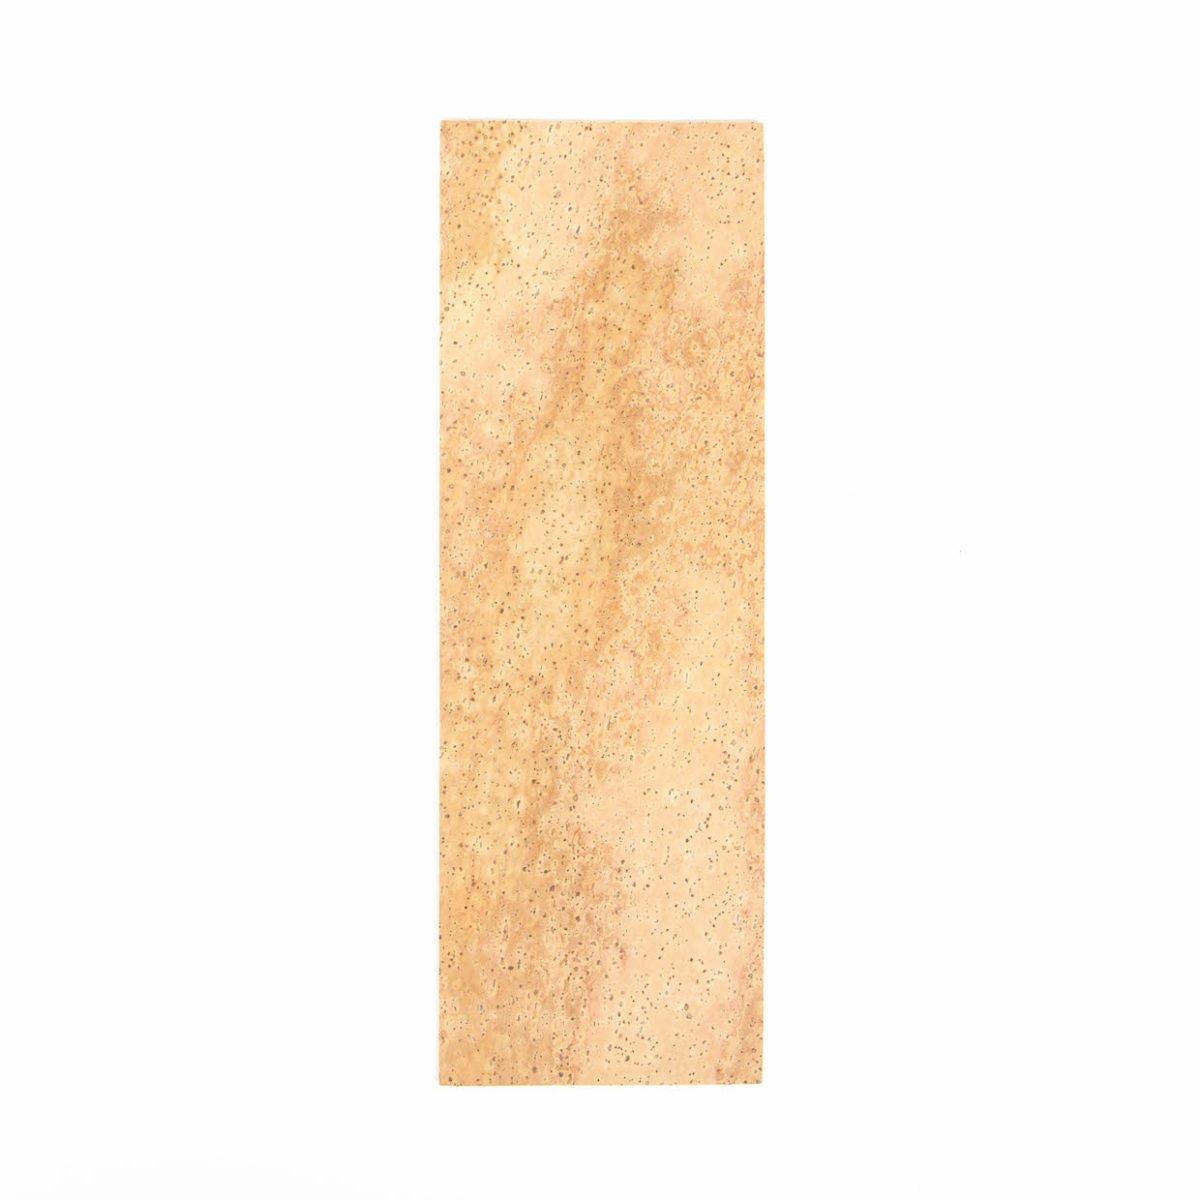 Filled Natural Sheet Cork